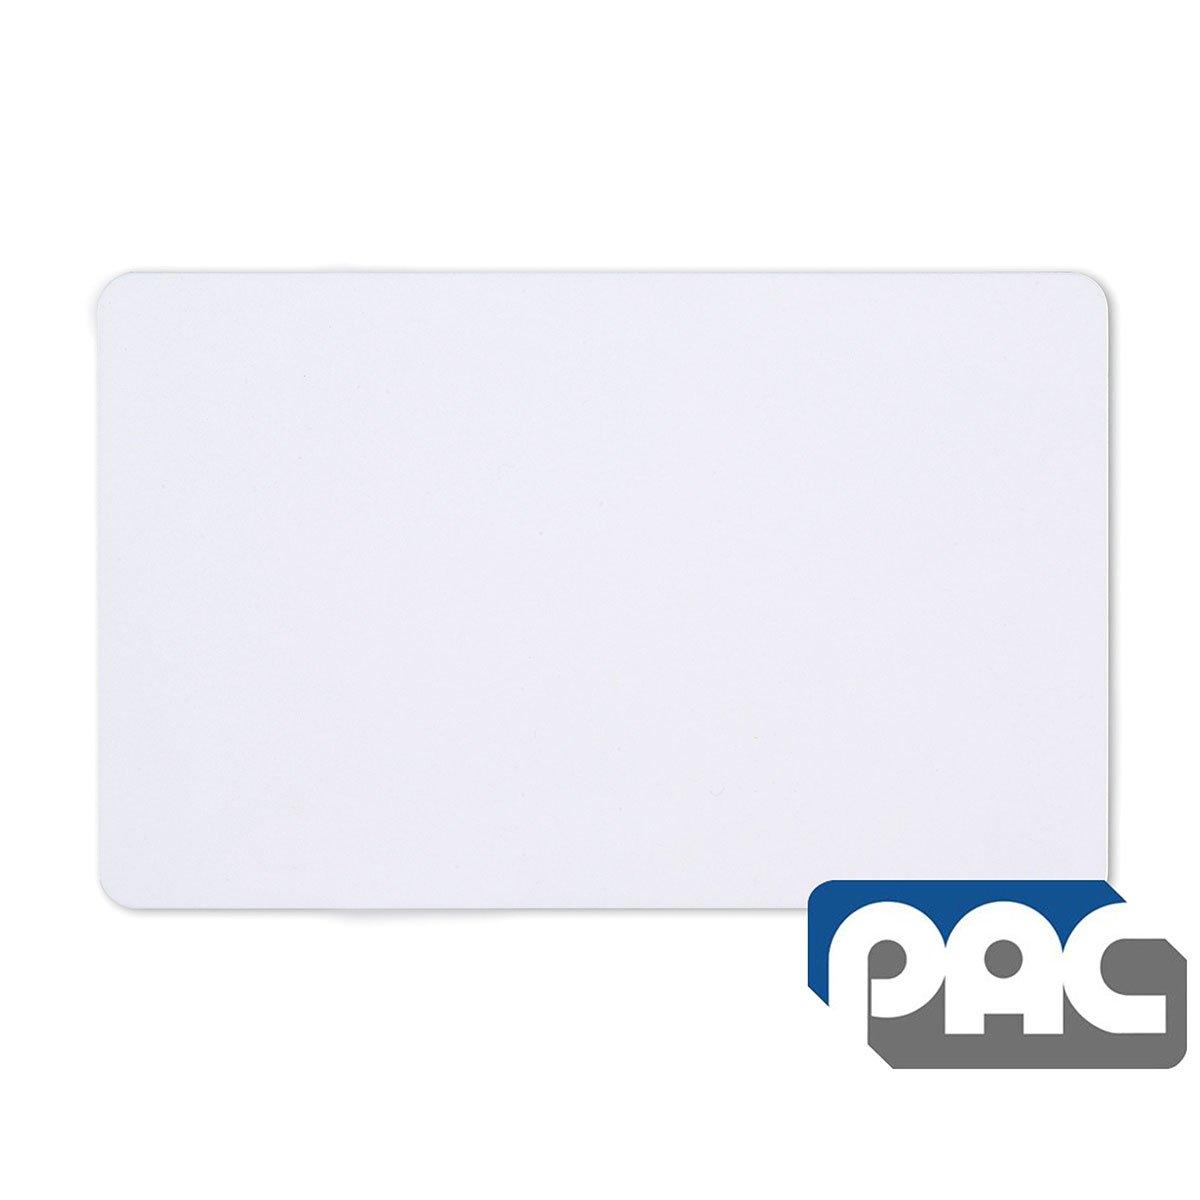 PAC 21039 ISO Proximity Card